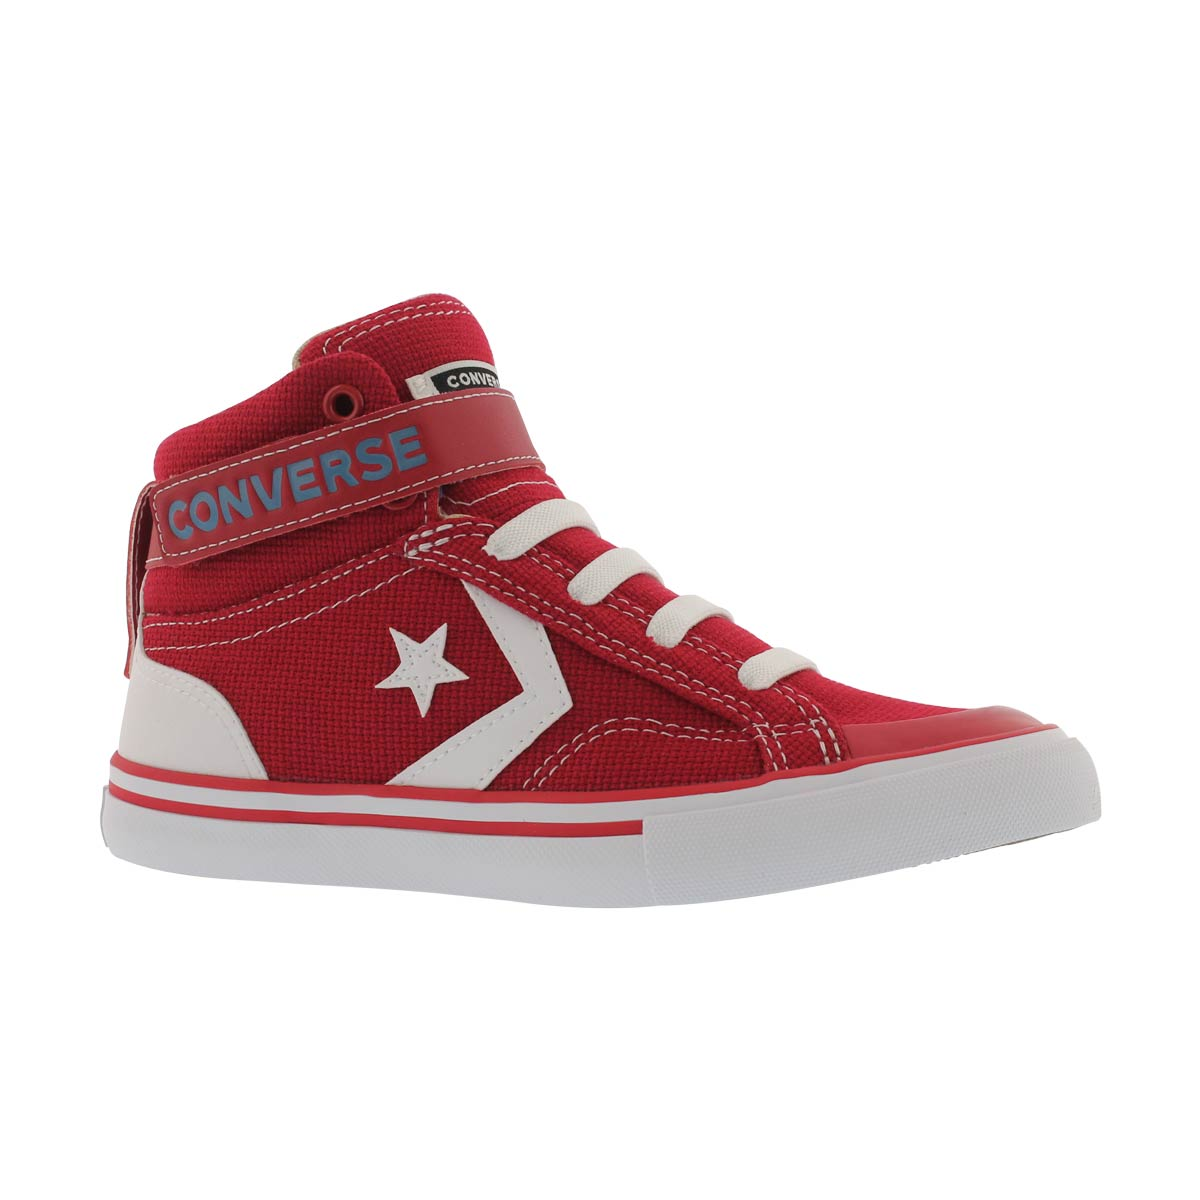 Boys' PRO BLAZE STRAP red hi top sneakers